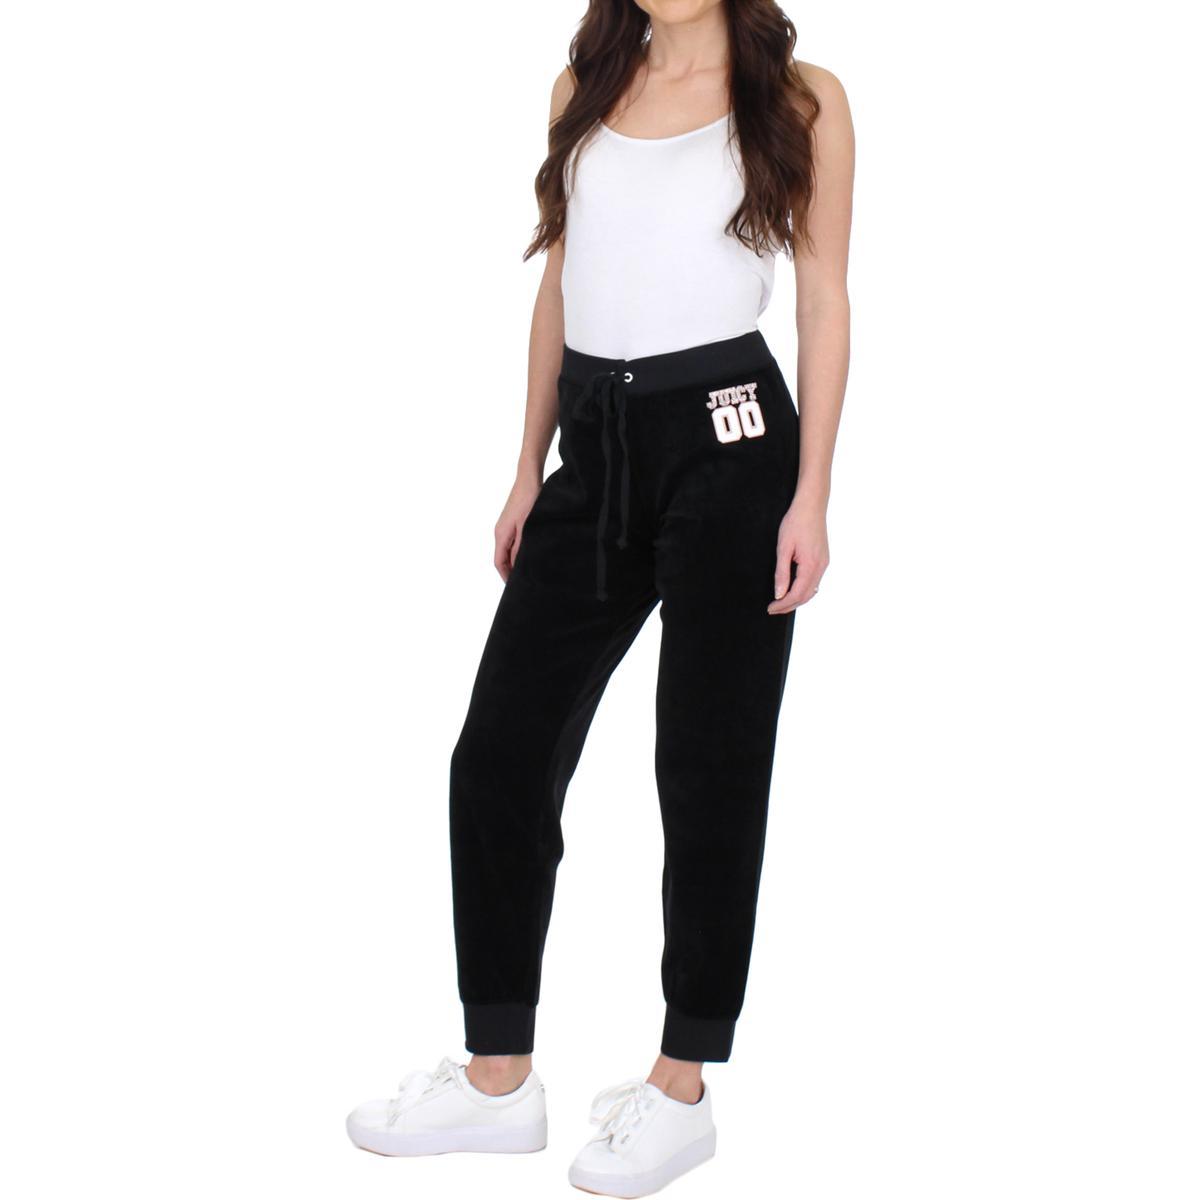 Juicy-Couture-Black-Label-Womens-00-Zuma-Velour-Jogger-Track-Pants-BHFO-5269